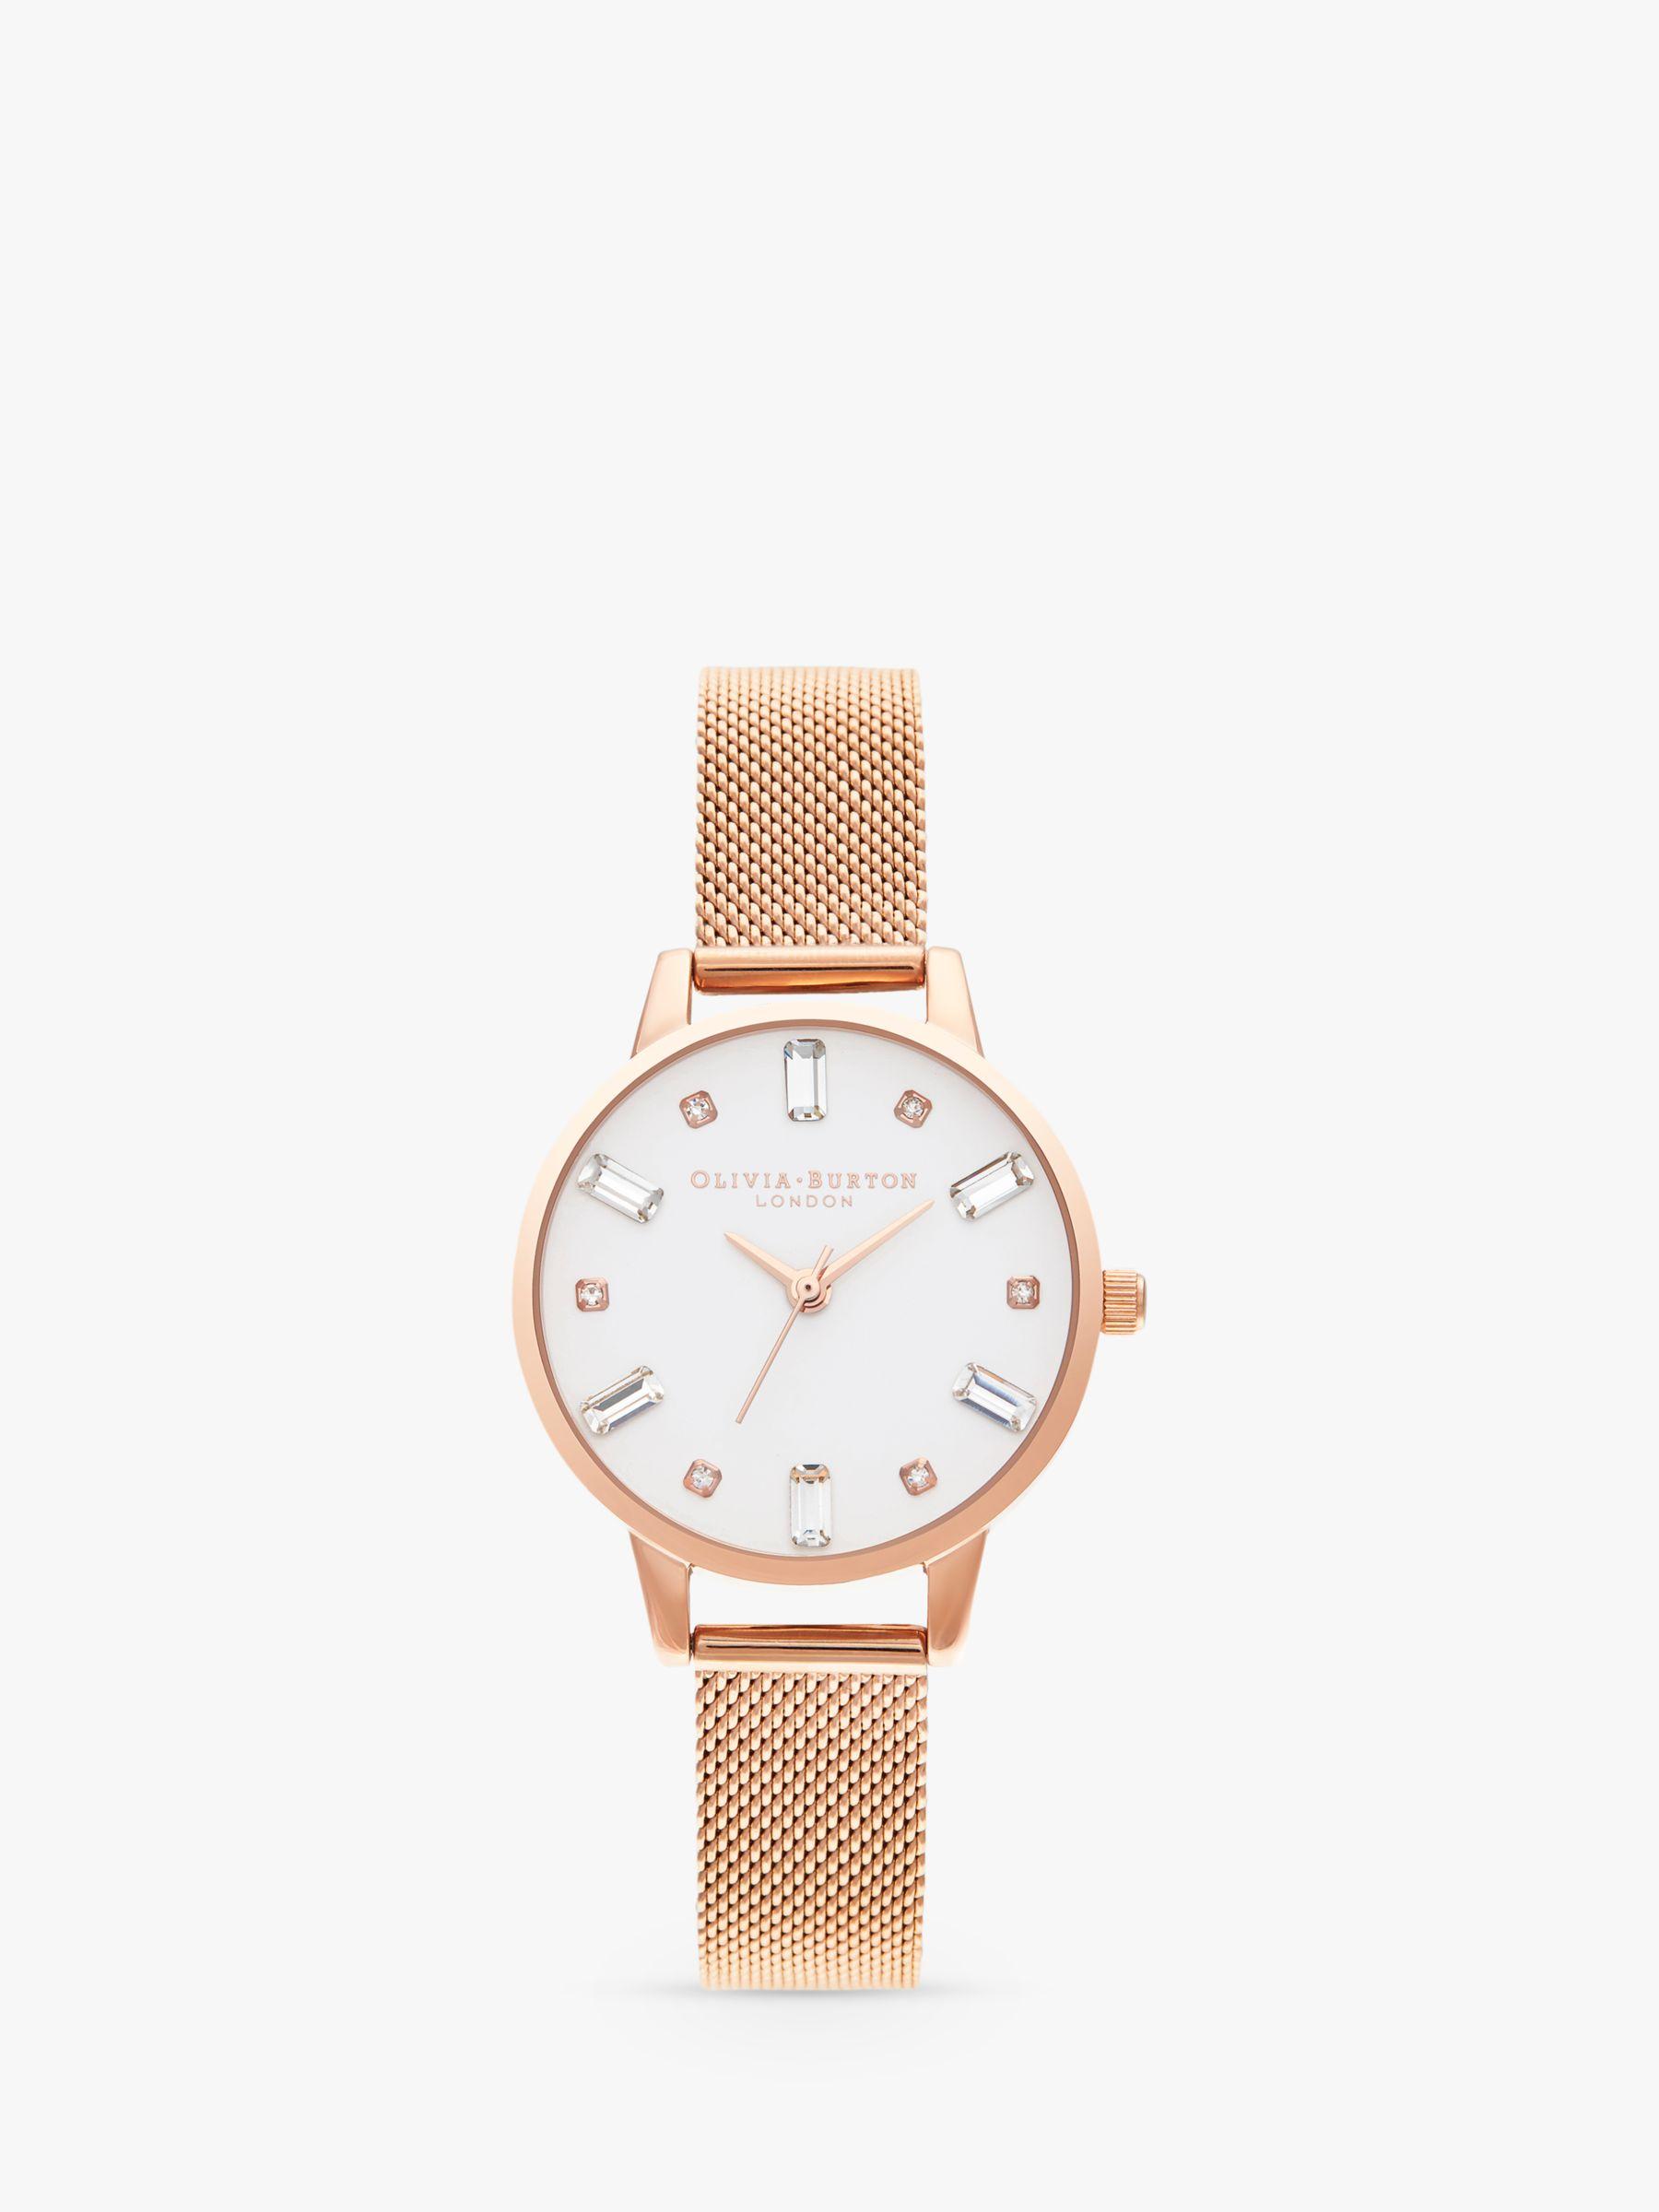 Olivia Burton Olivia Burton OB16BJ02 Women's Bejewelled Mesh Bracelet Strap Watch, Rose Gold/White